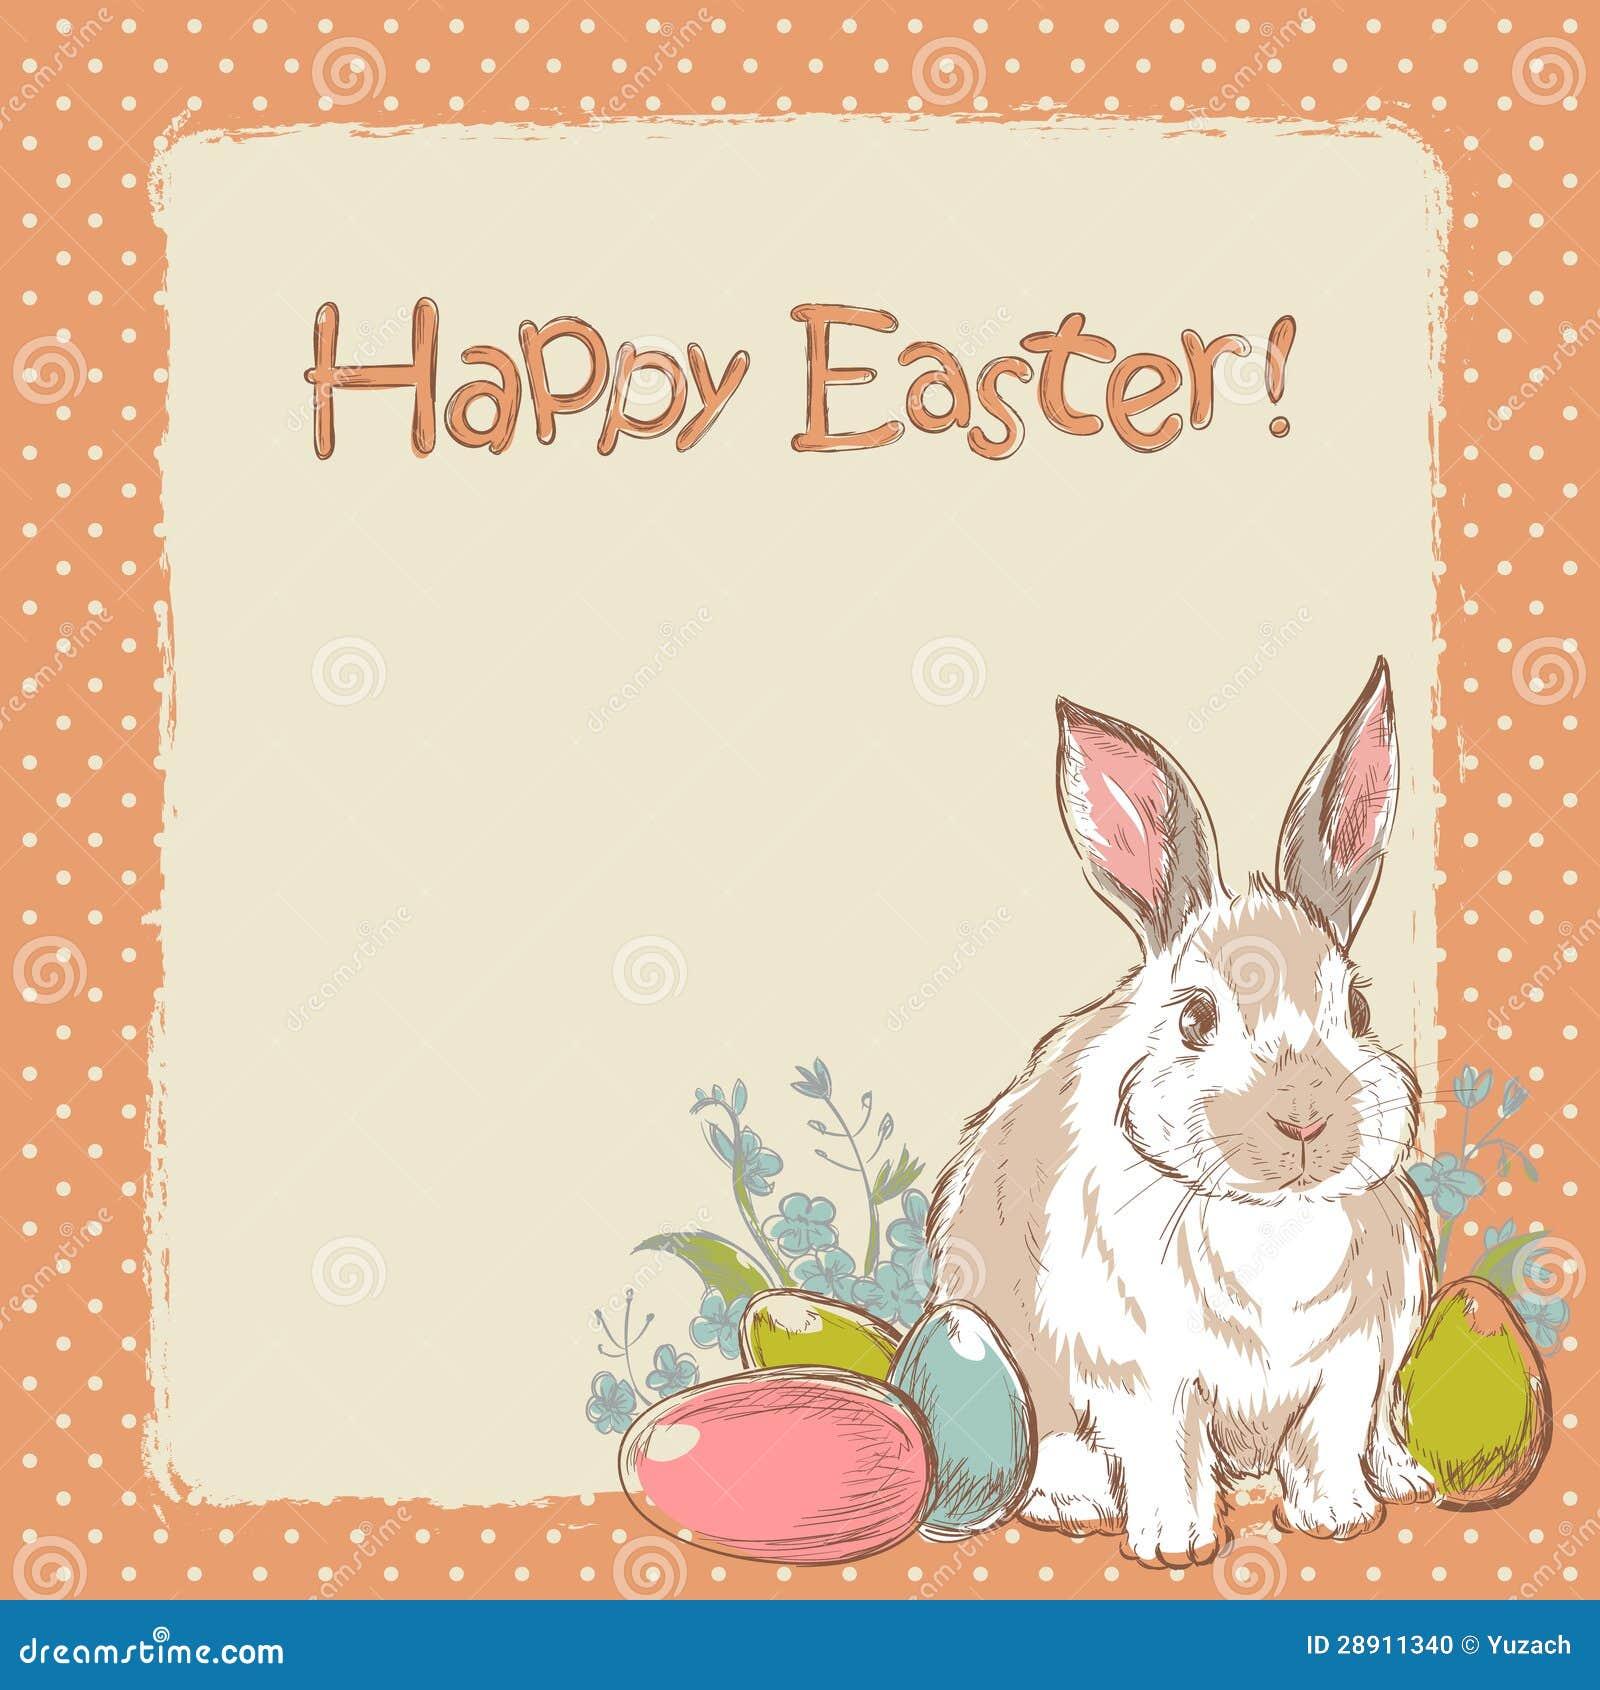 Easter bunny retro card stock vector. Image of cartoon ...